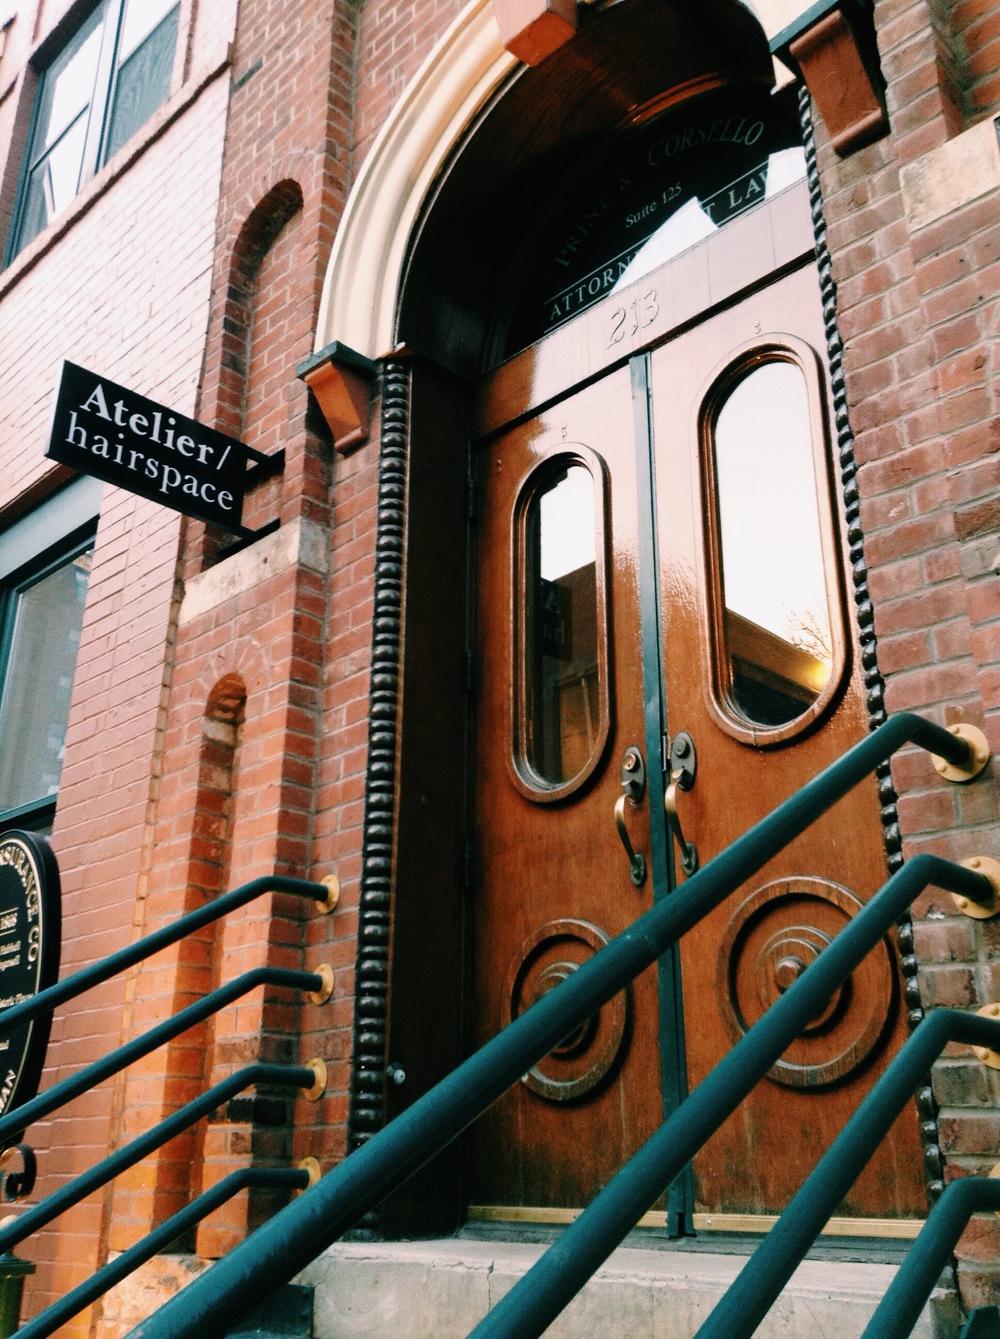 Atelier /hairspace 213 4th Street, Suite 16 Des Moines, Iowa 50309